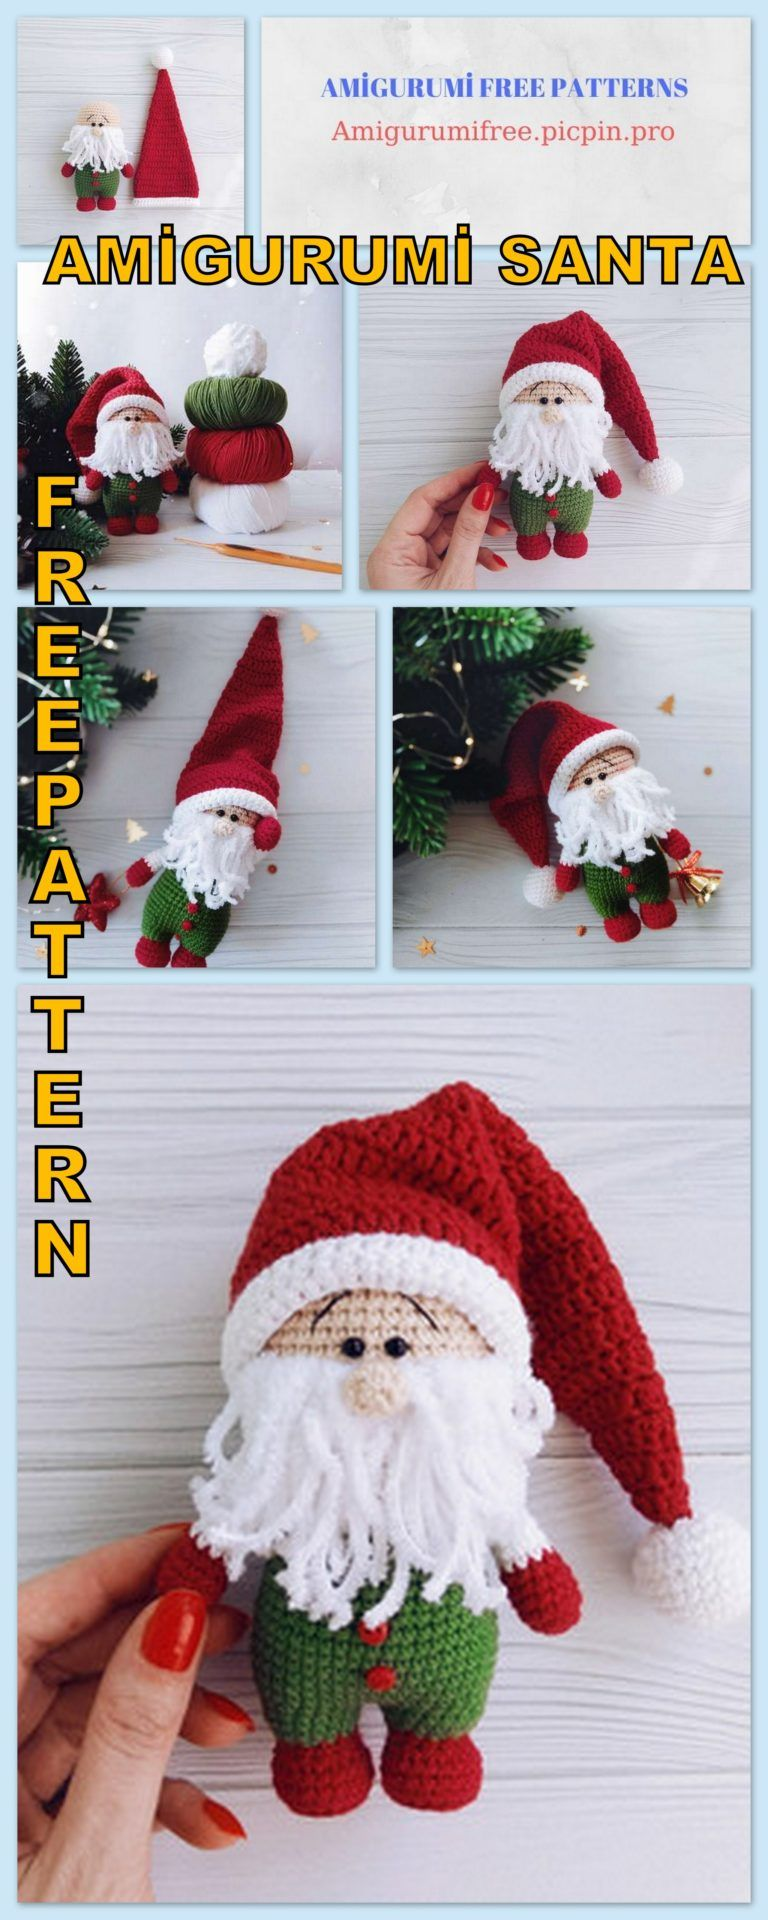 Crochet Santa Claus Plushie: Free Crochet Christmas Pattern | | 1920x768